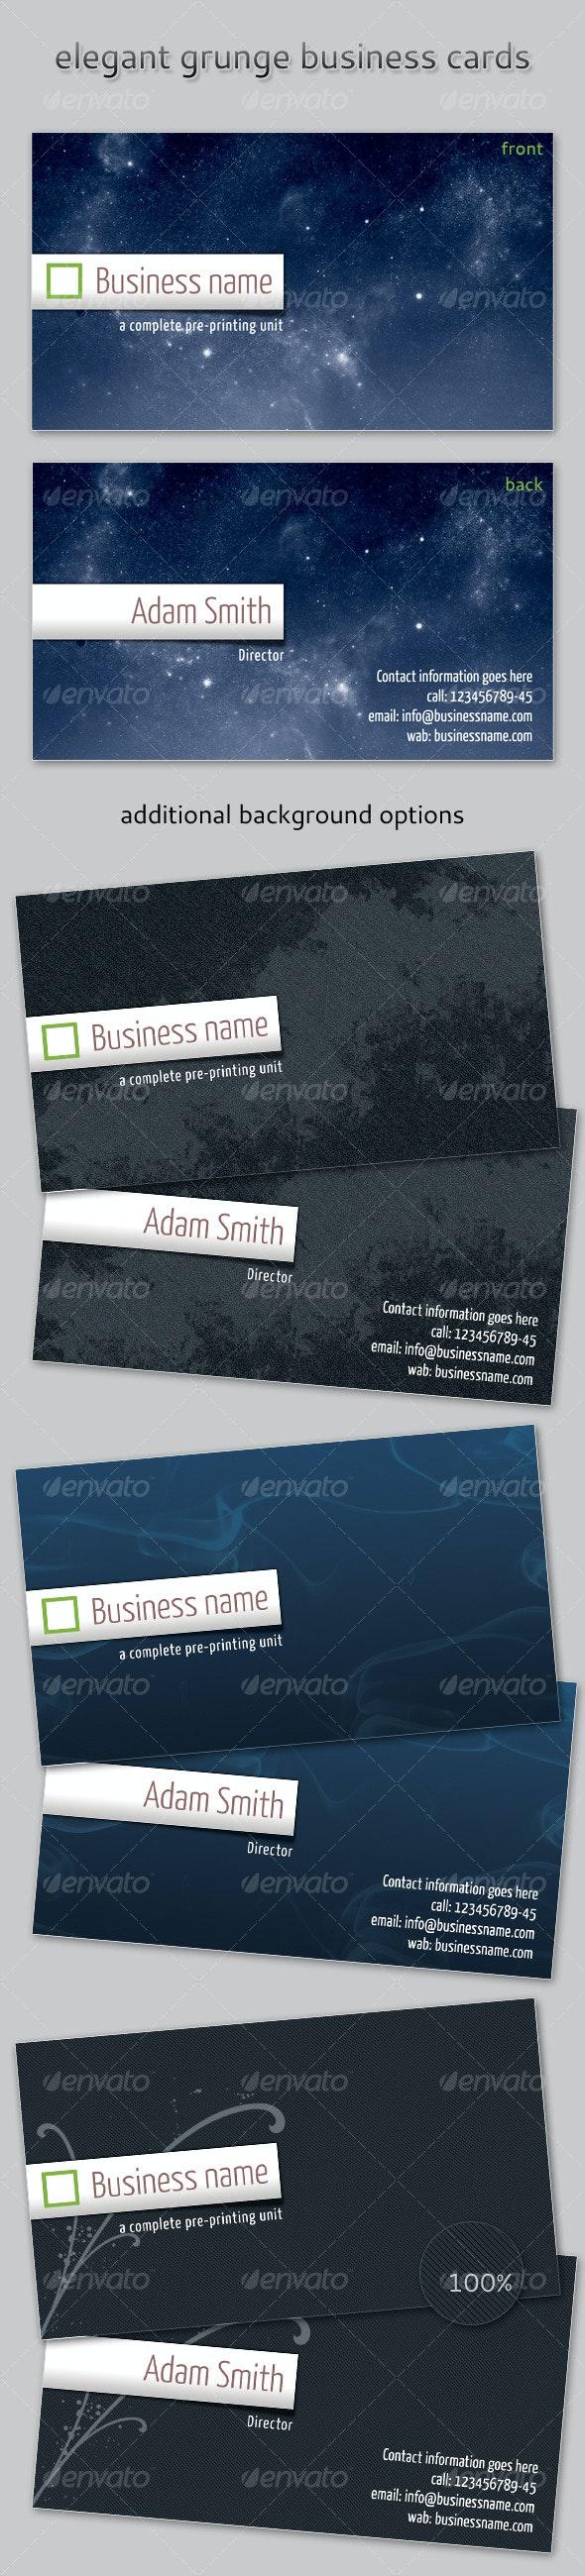 Elegant Grunge Business Card - Creative Business Cards